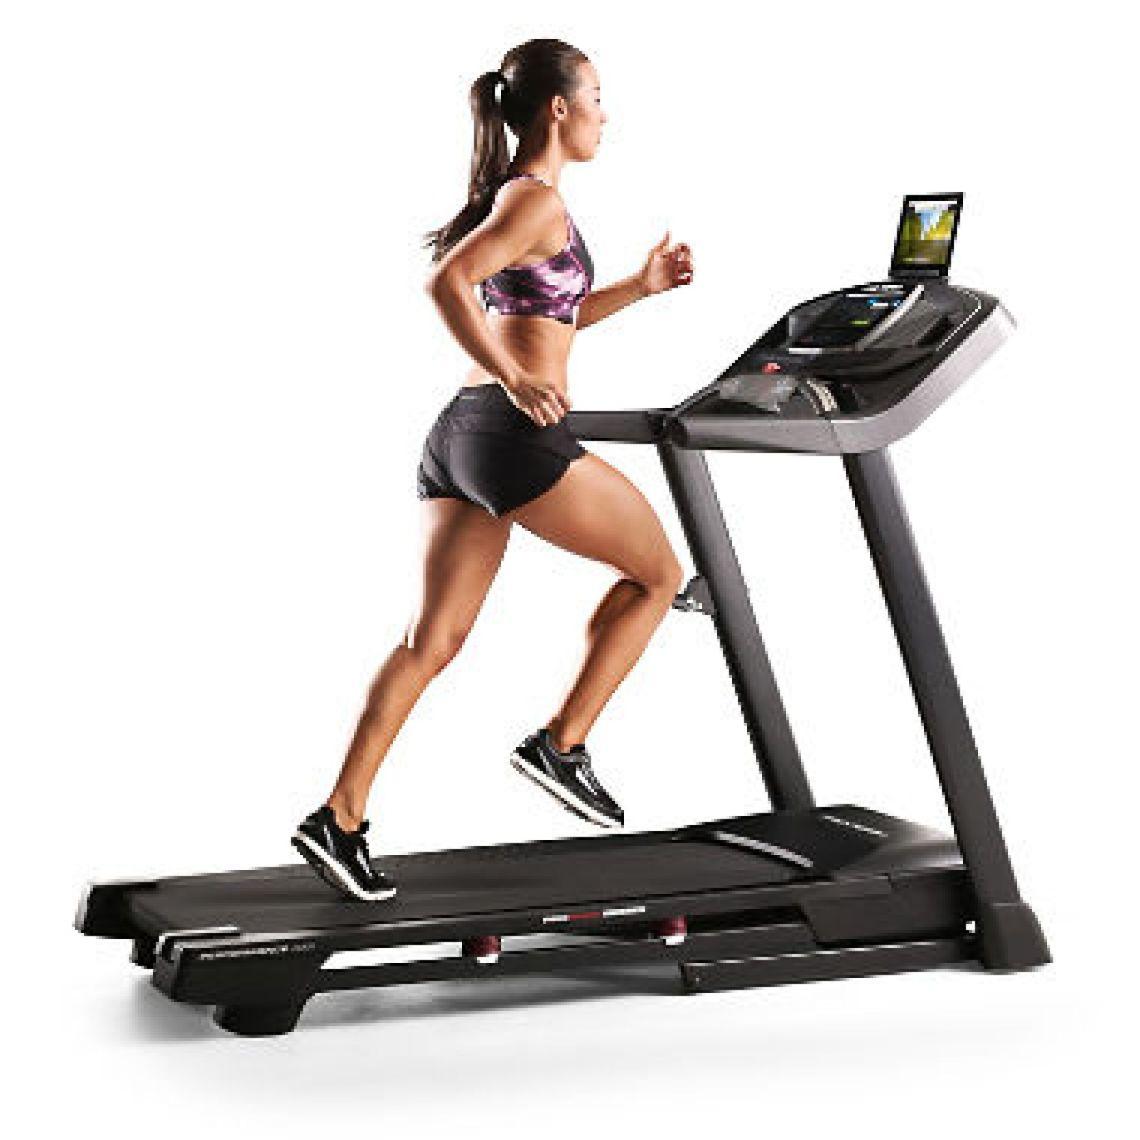 ProForm Performance 900i Treadmill - Sam's Club